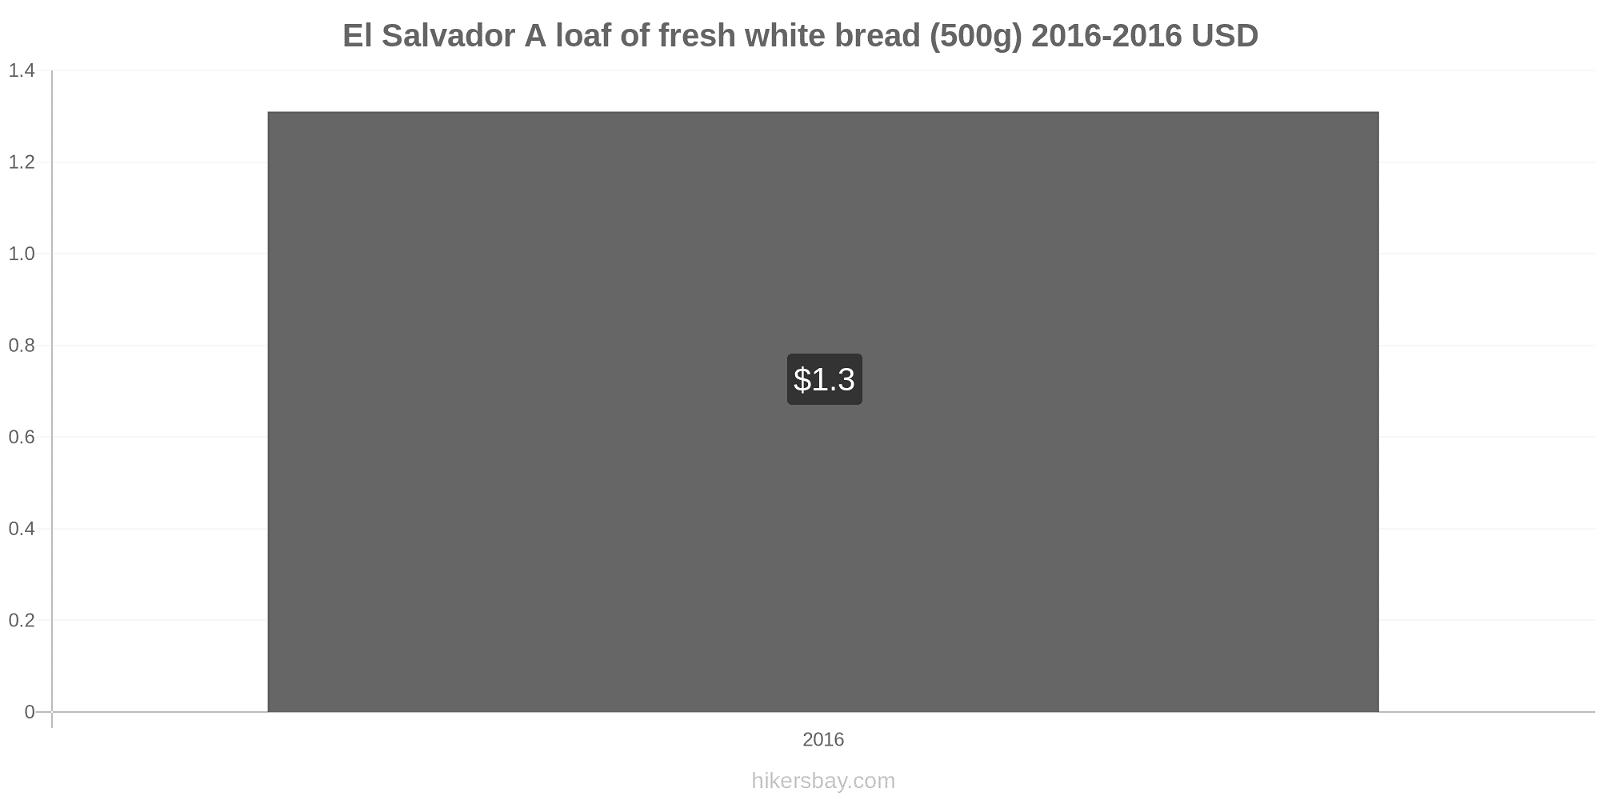 El Salvador price changes A loaf of fresh white bread (500g) hikersbay.com